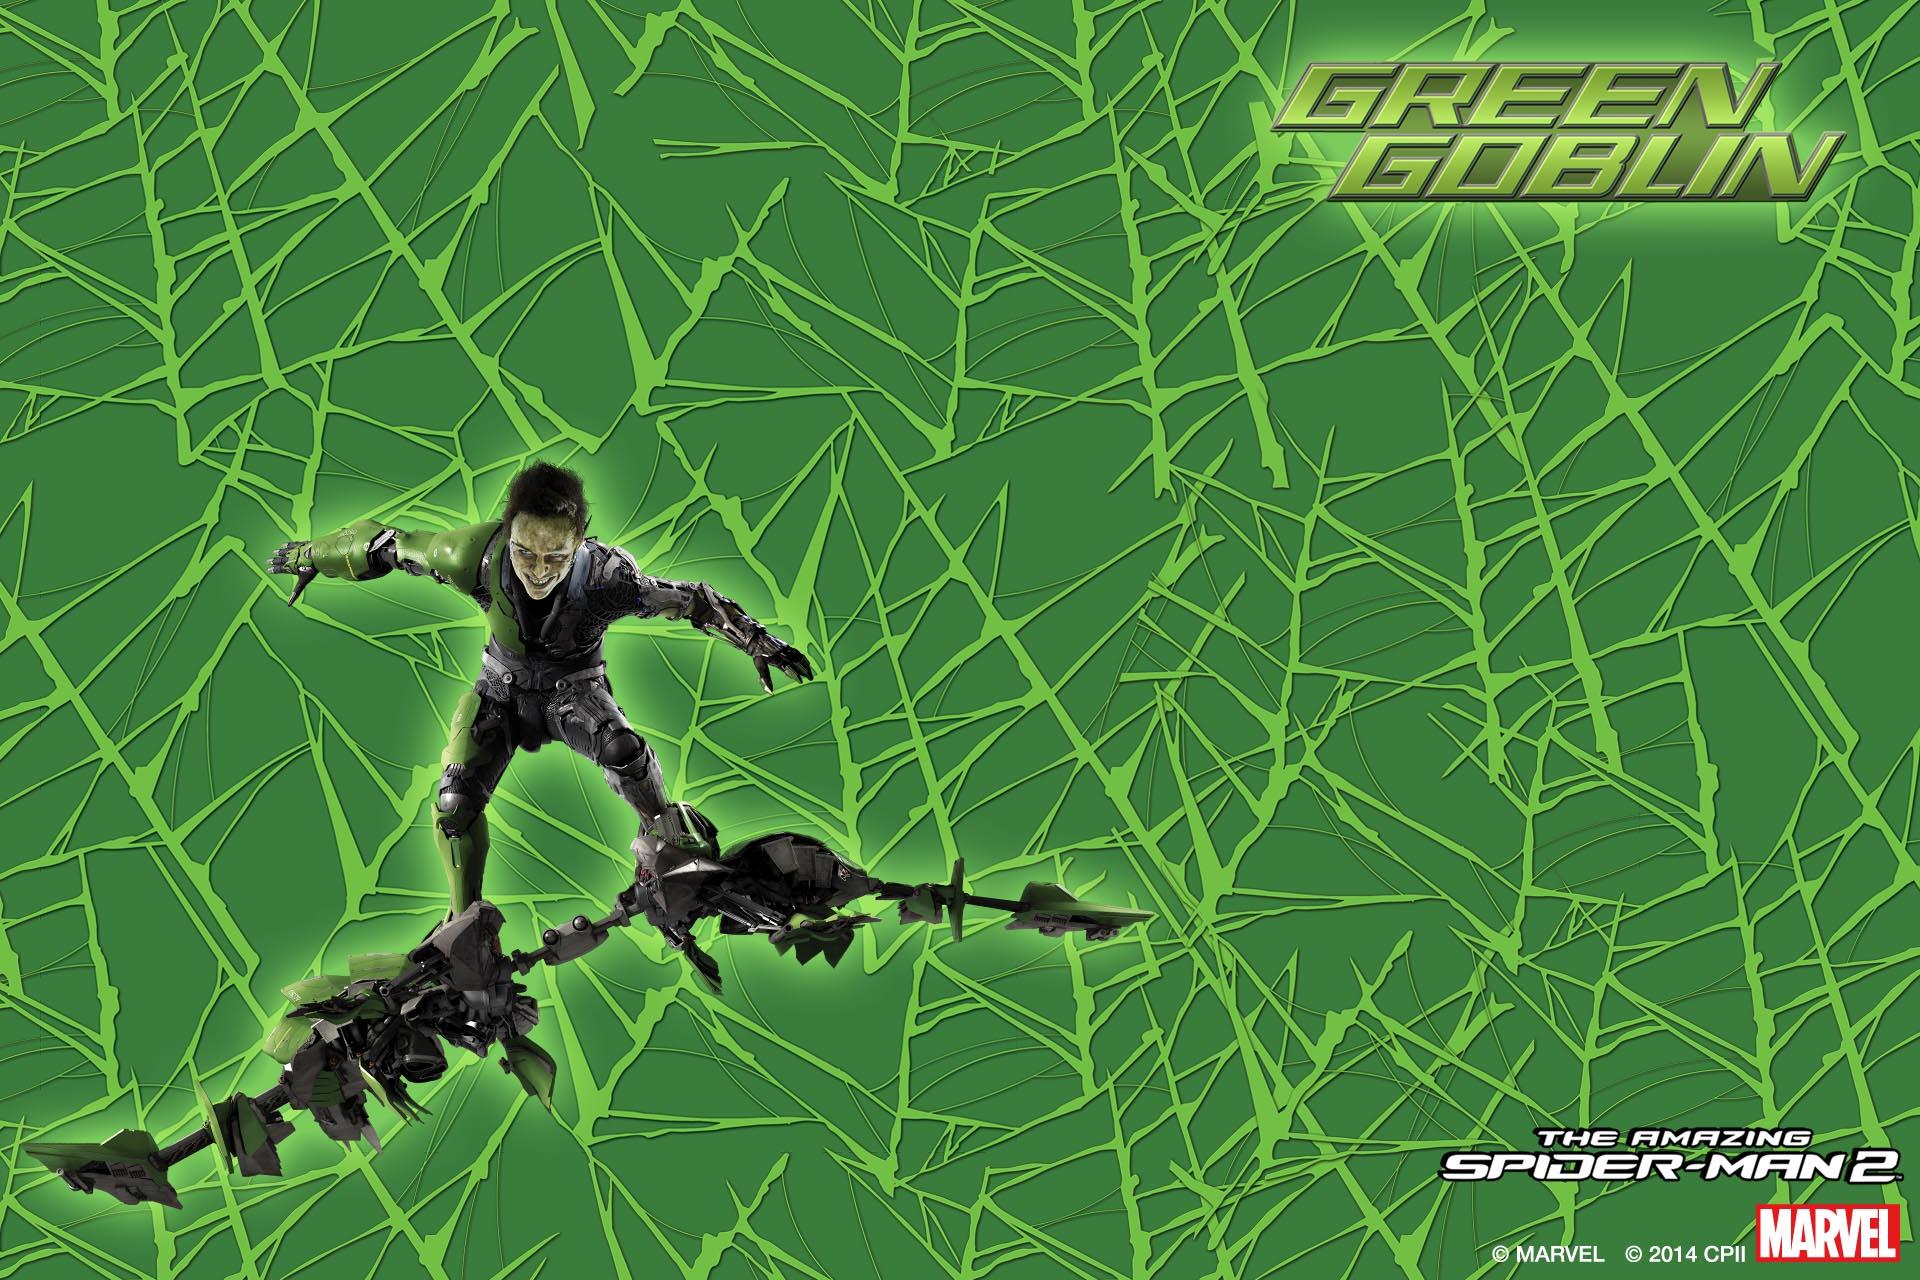 image - desktop-wallpaper-5-1- | amazing spider-man wiki